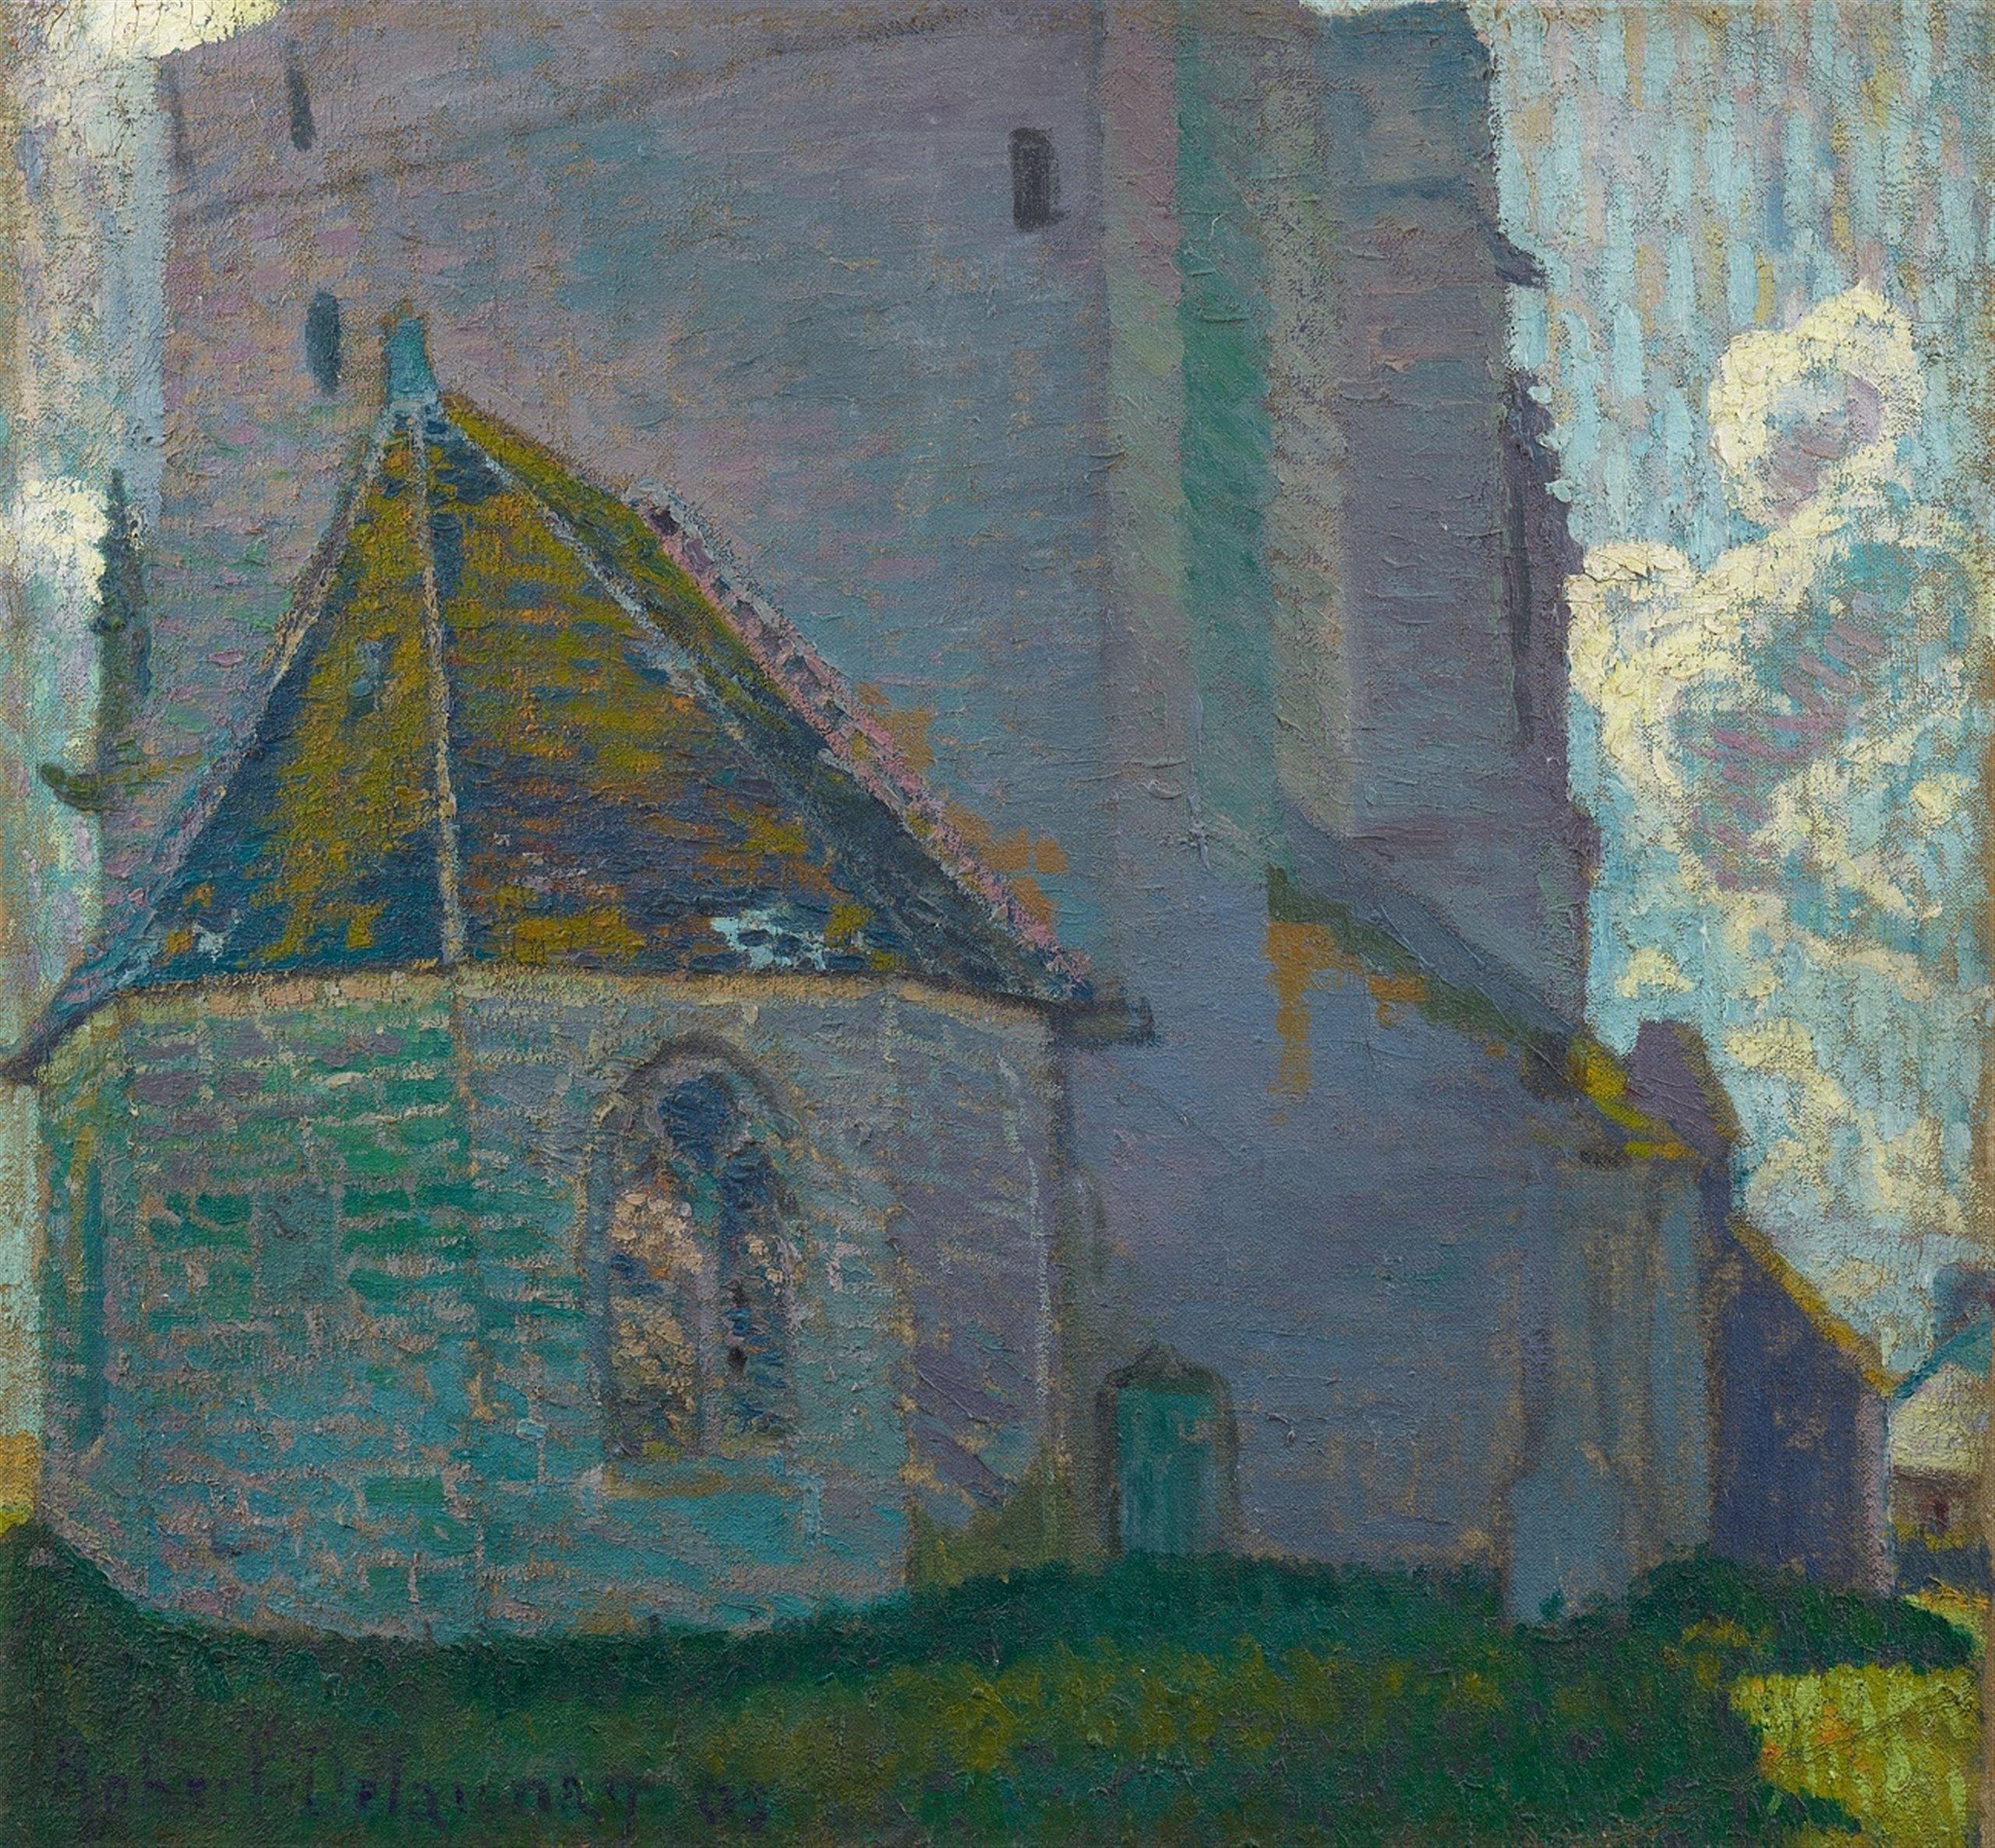 Robert Delaunay, Église, Bretagne, 1905, image ©Lempertz